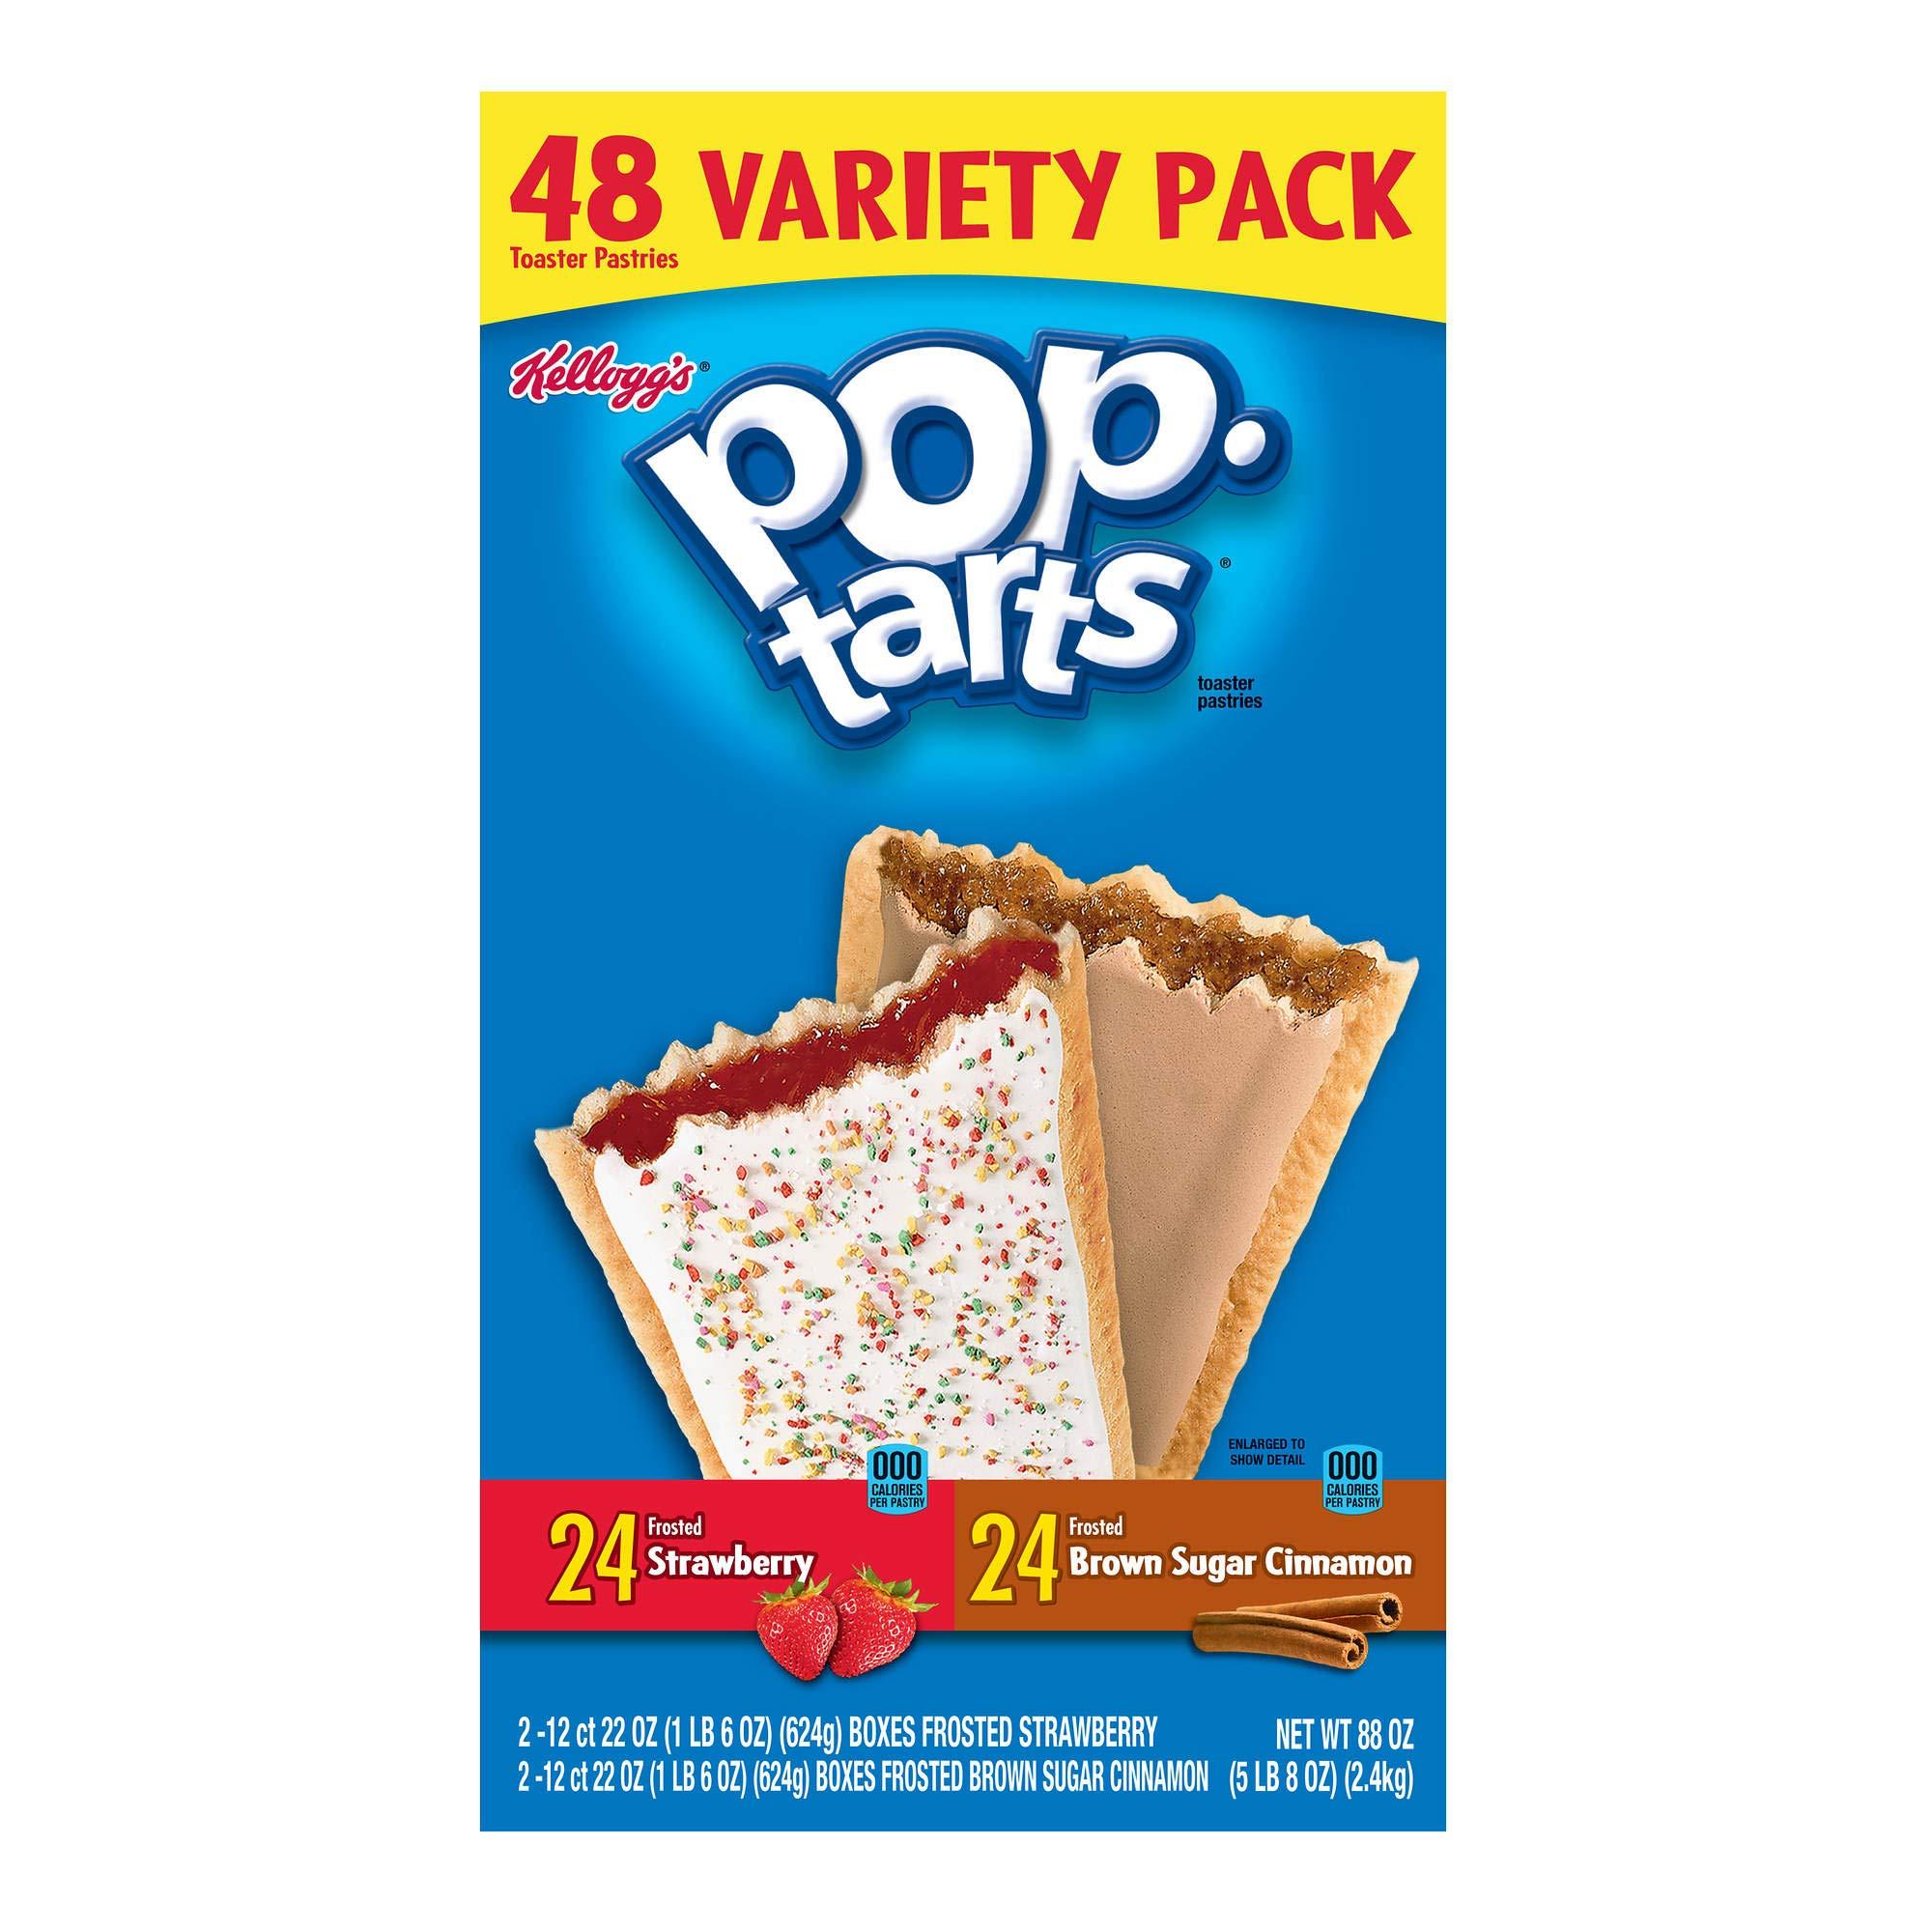 Kellogg's Pop Tarts Strawberry and Brown Sugar Variety Pack, 48 ct. by Kellogg's (Image #1)